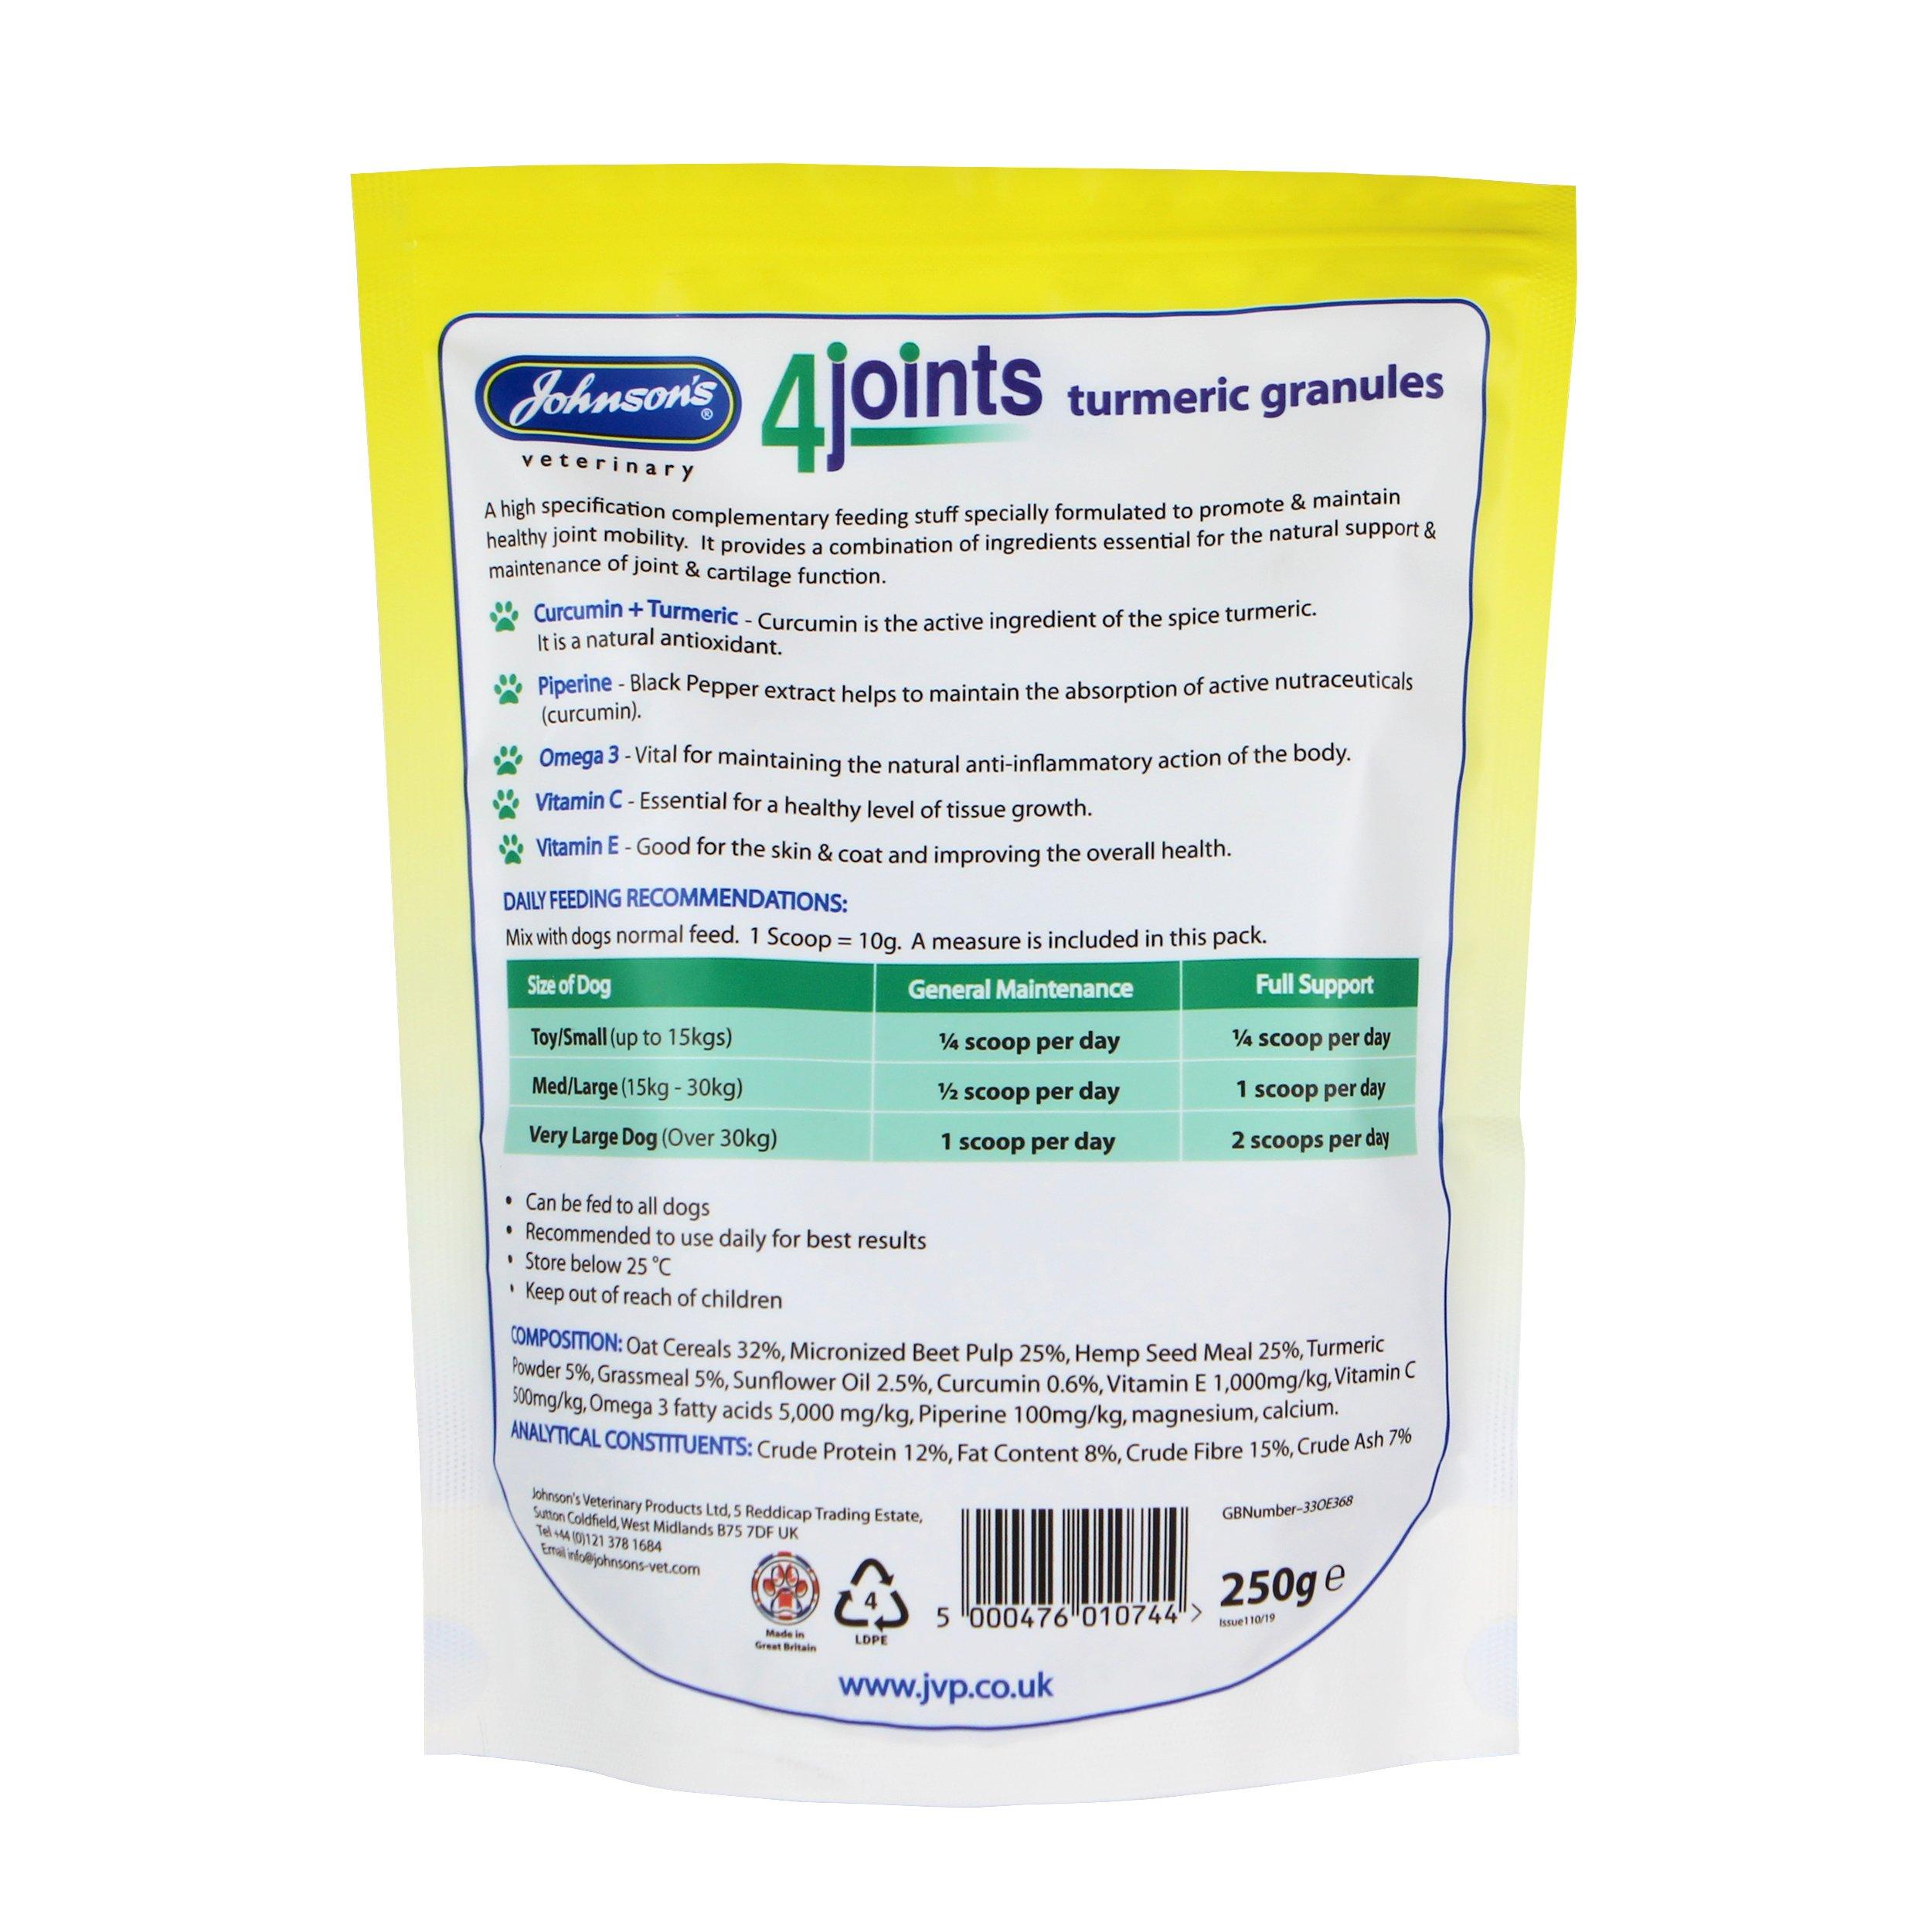 Johnson's 4Joints Turmeric Granules Back of Pack